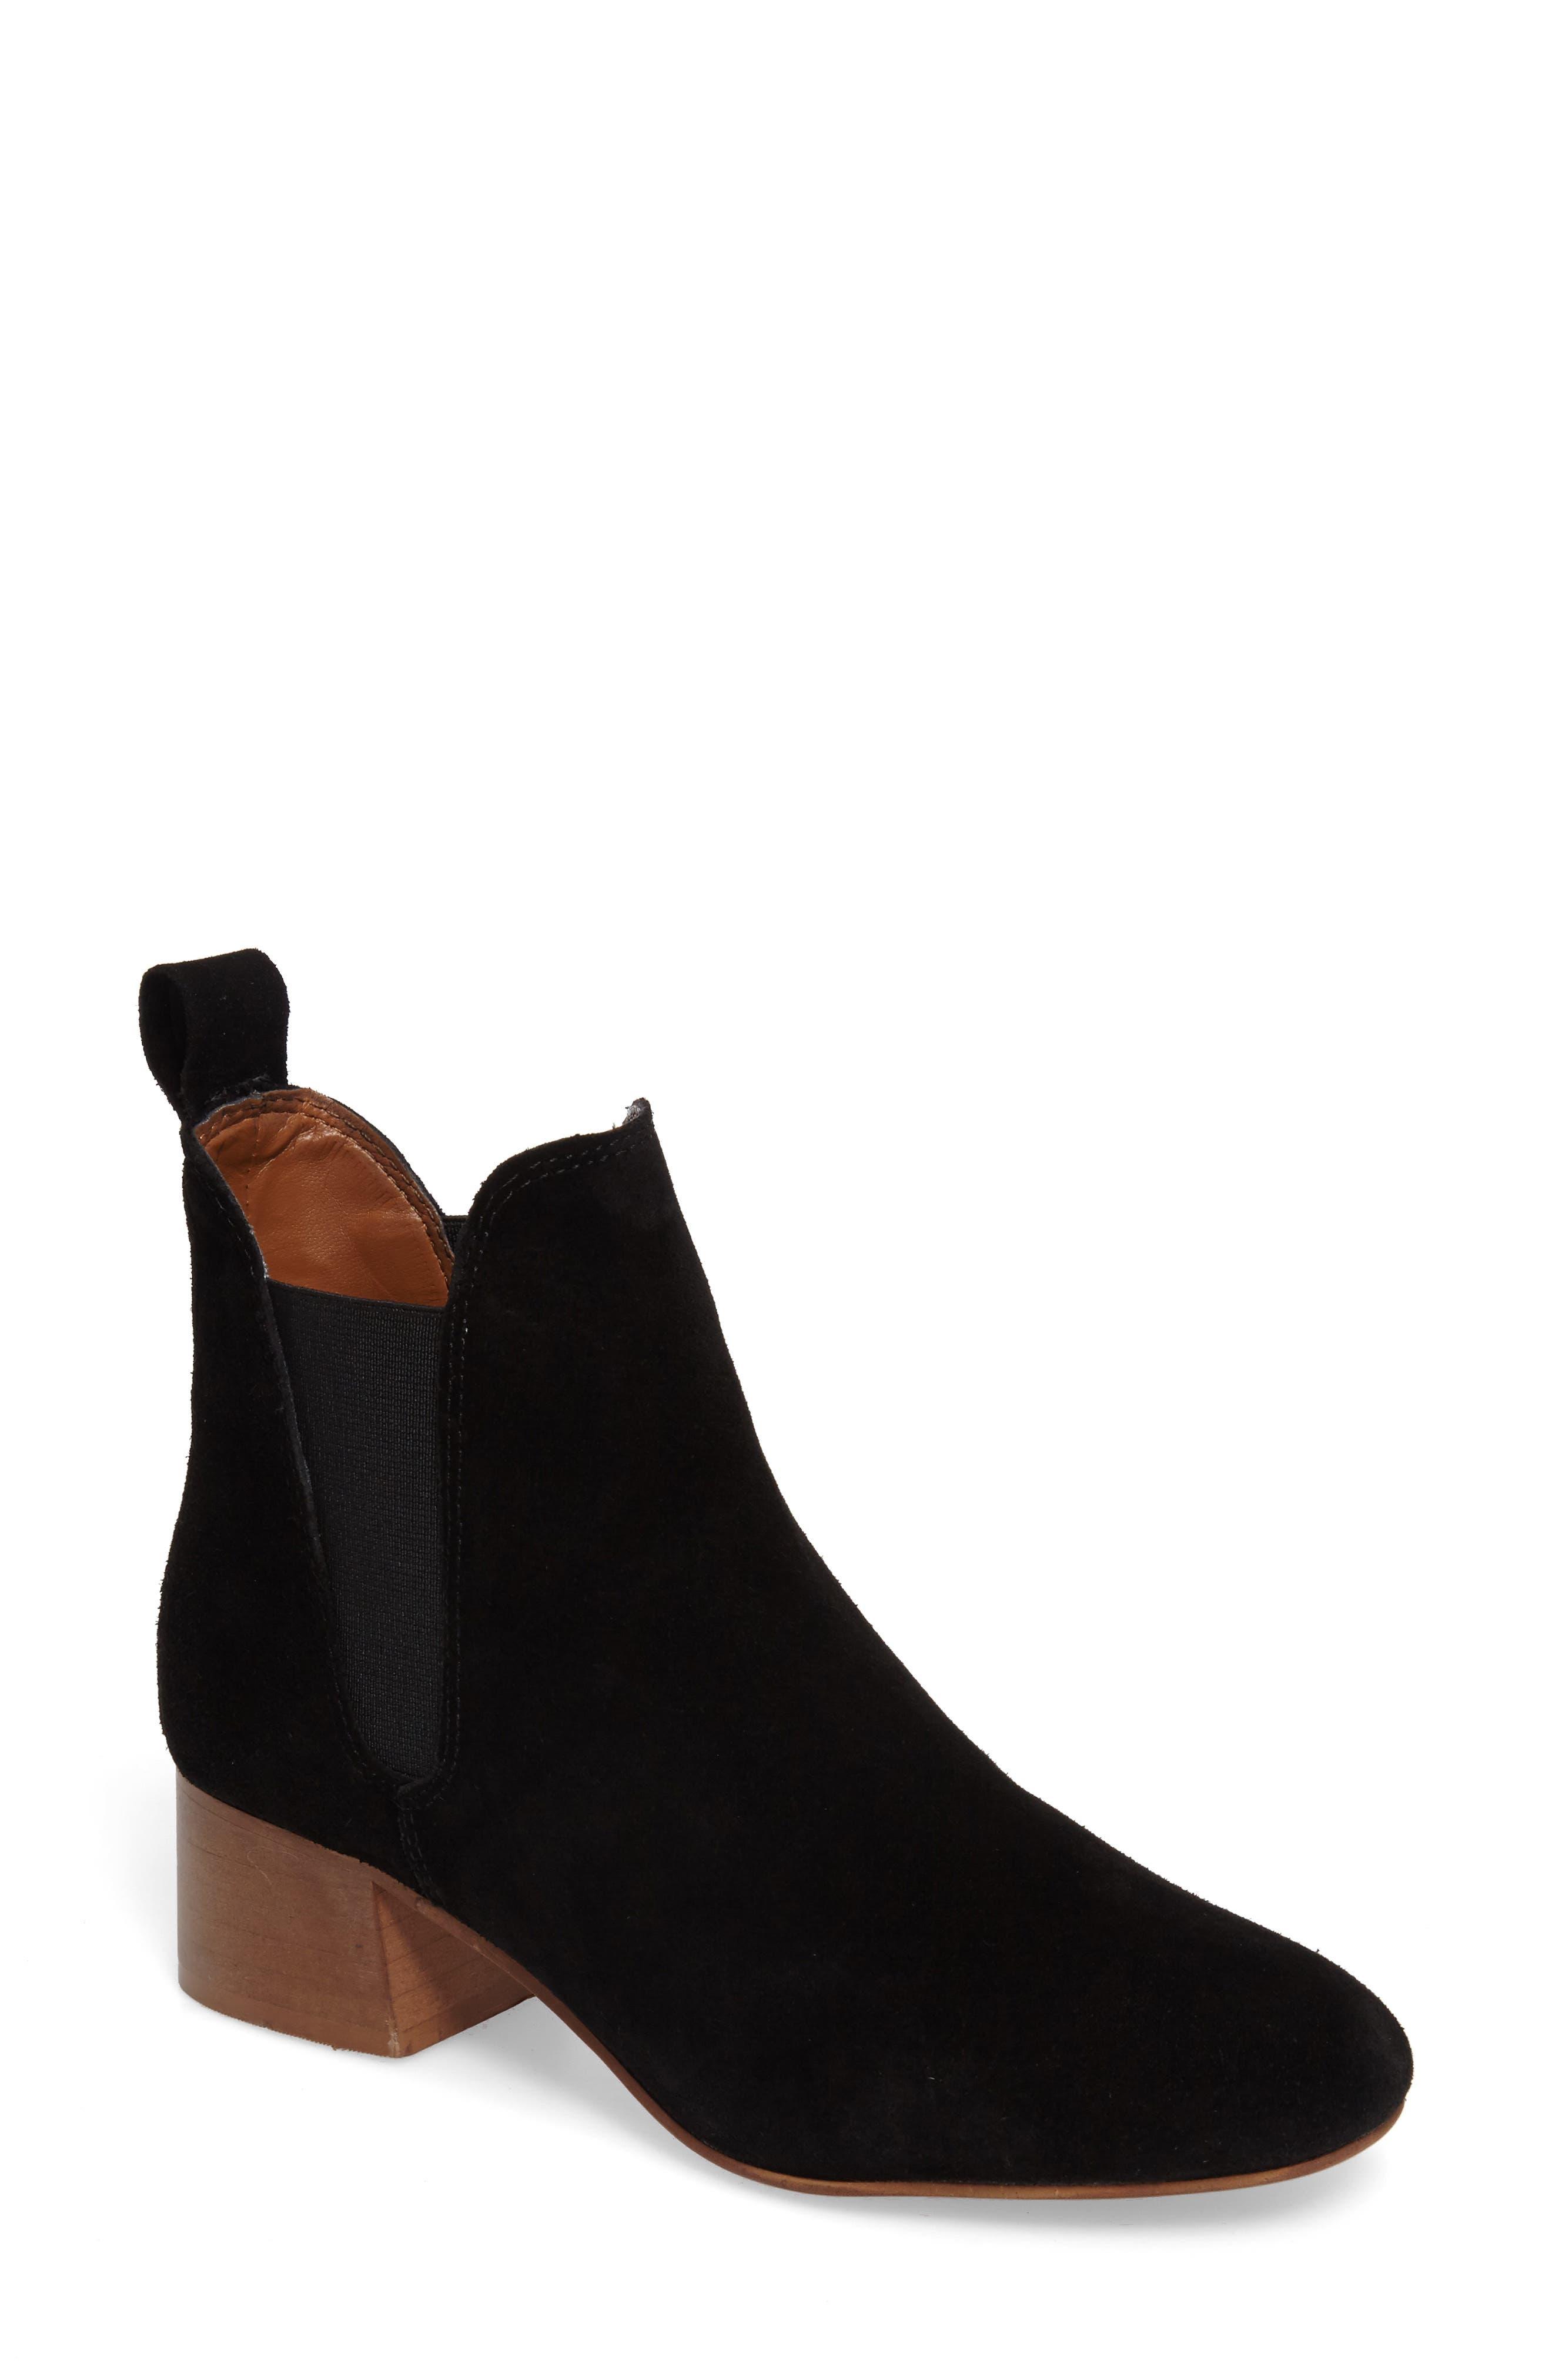 Barley Chelsea Boot,                         Main,                         color, Black